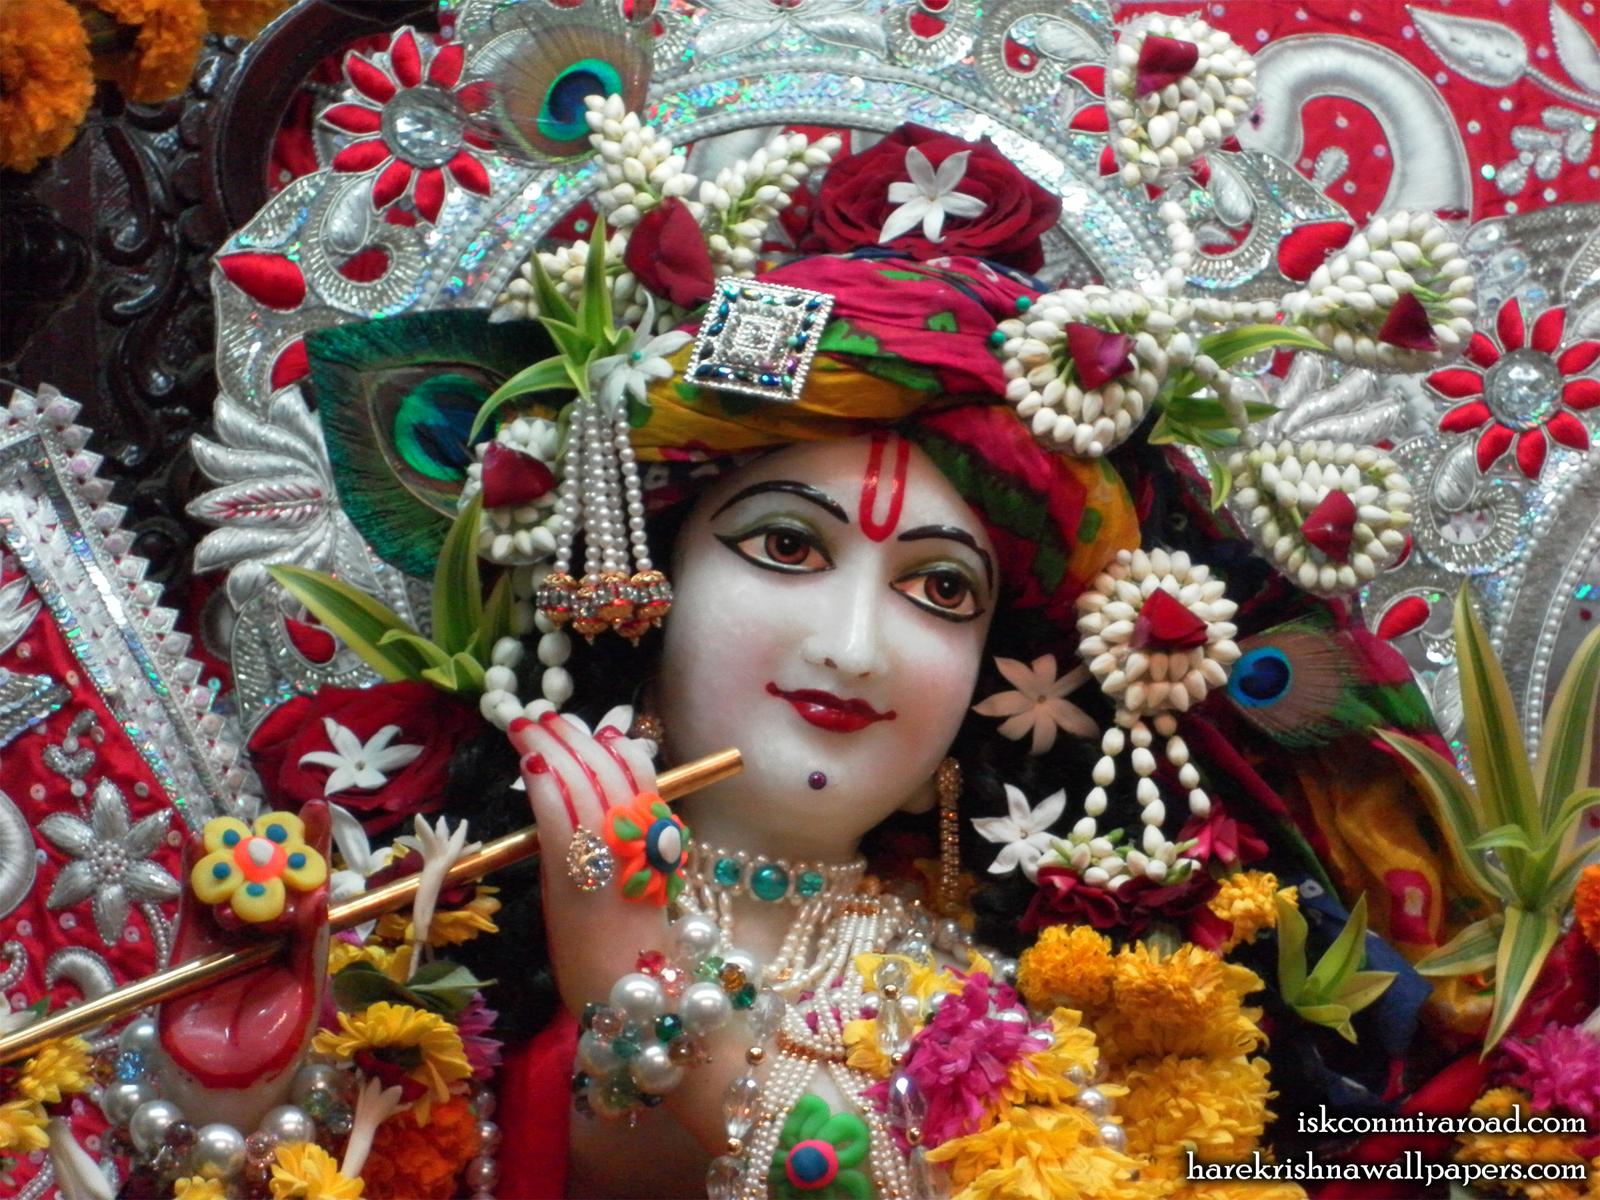 Sri Giridhari Close up Wallpaper (014) Size1600x1200 Download